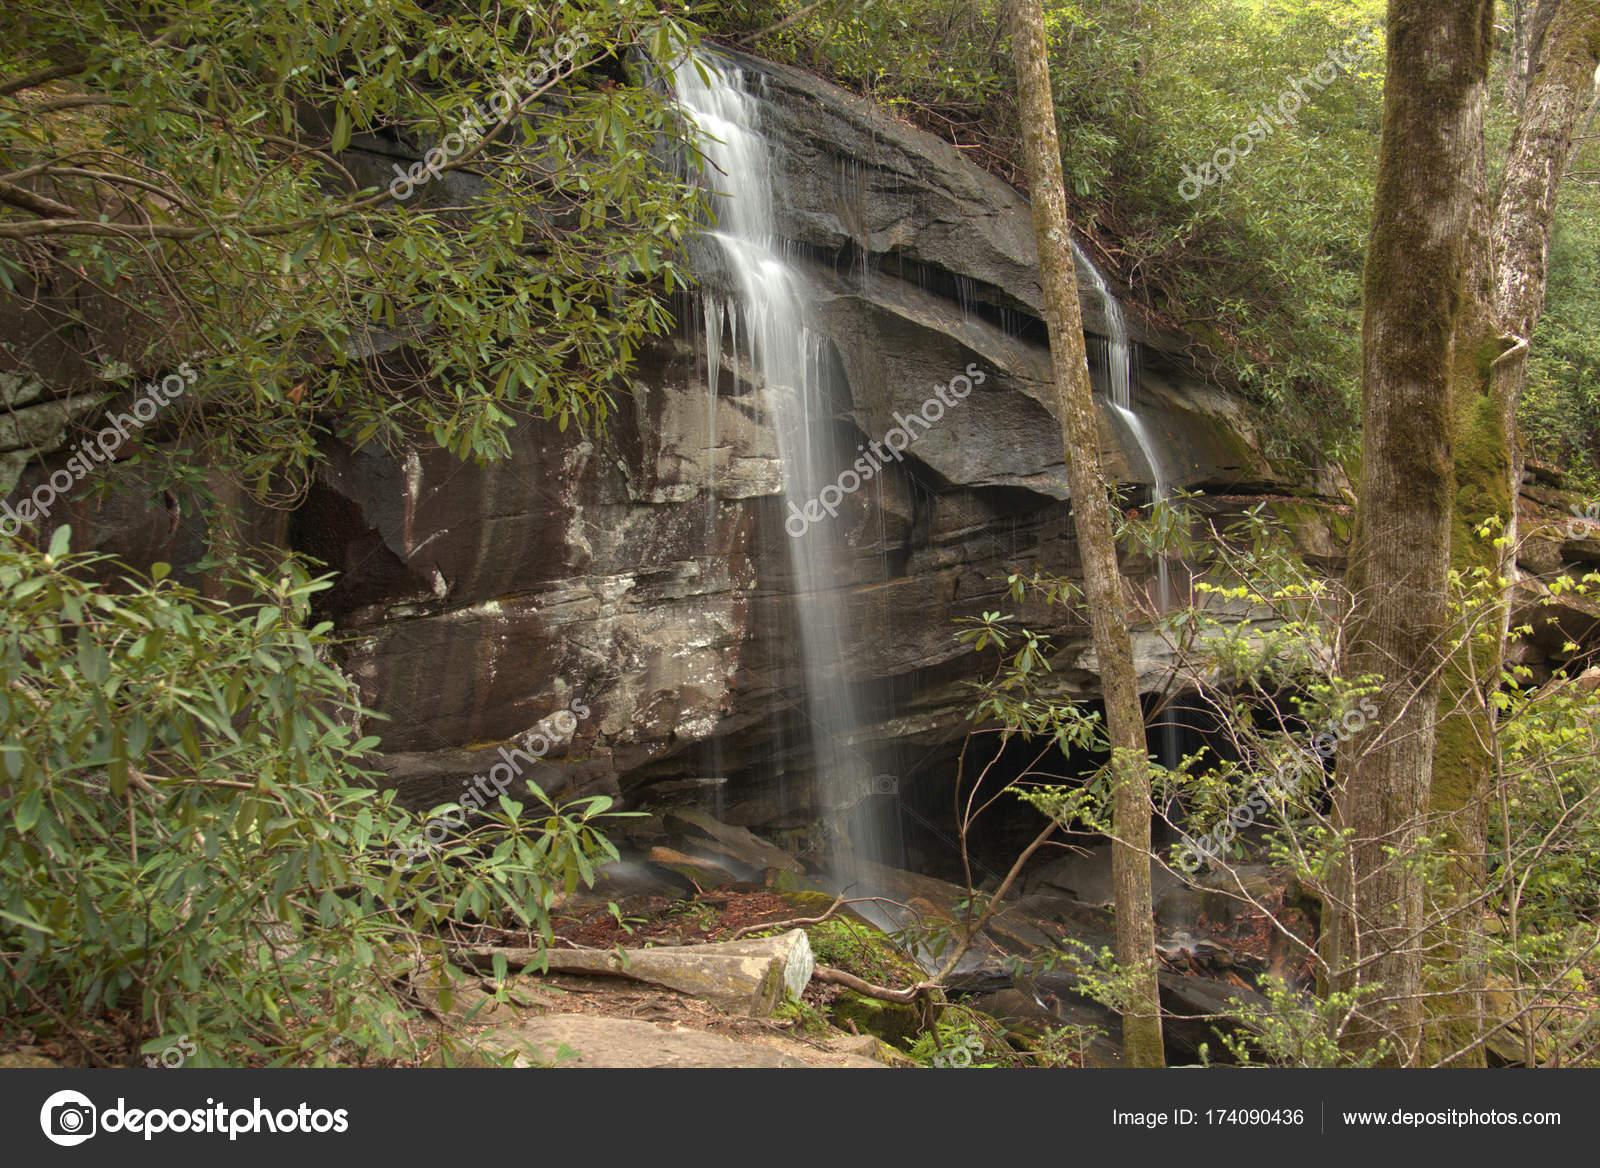 Chasing Water Falls in North Carolina along the Blue Ridge